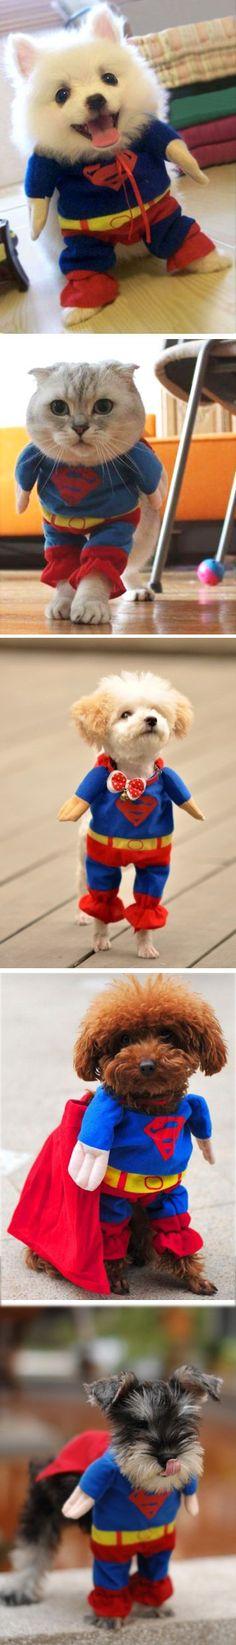 Pets Superman Costume - AMAZE!